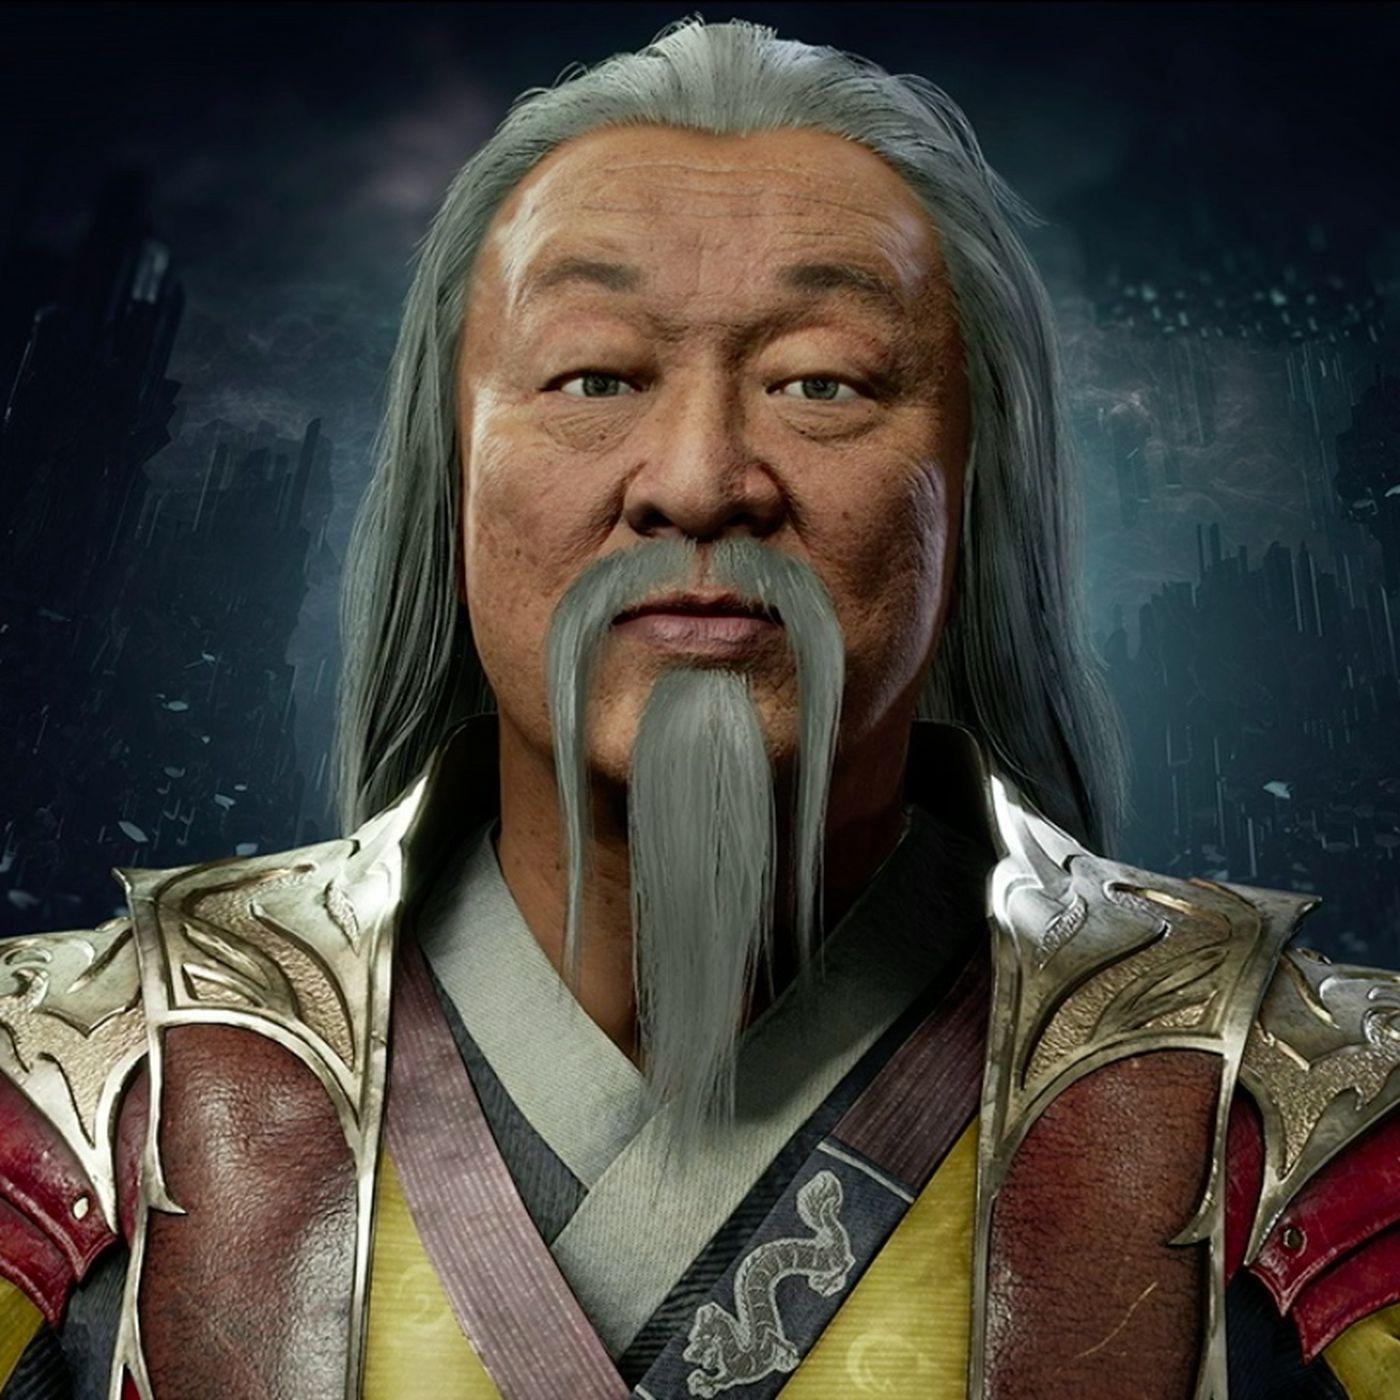 Shang Tsung Is Mortal Kombat 11 S First Dlc Character Polygon